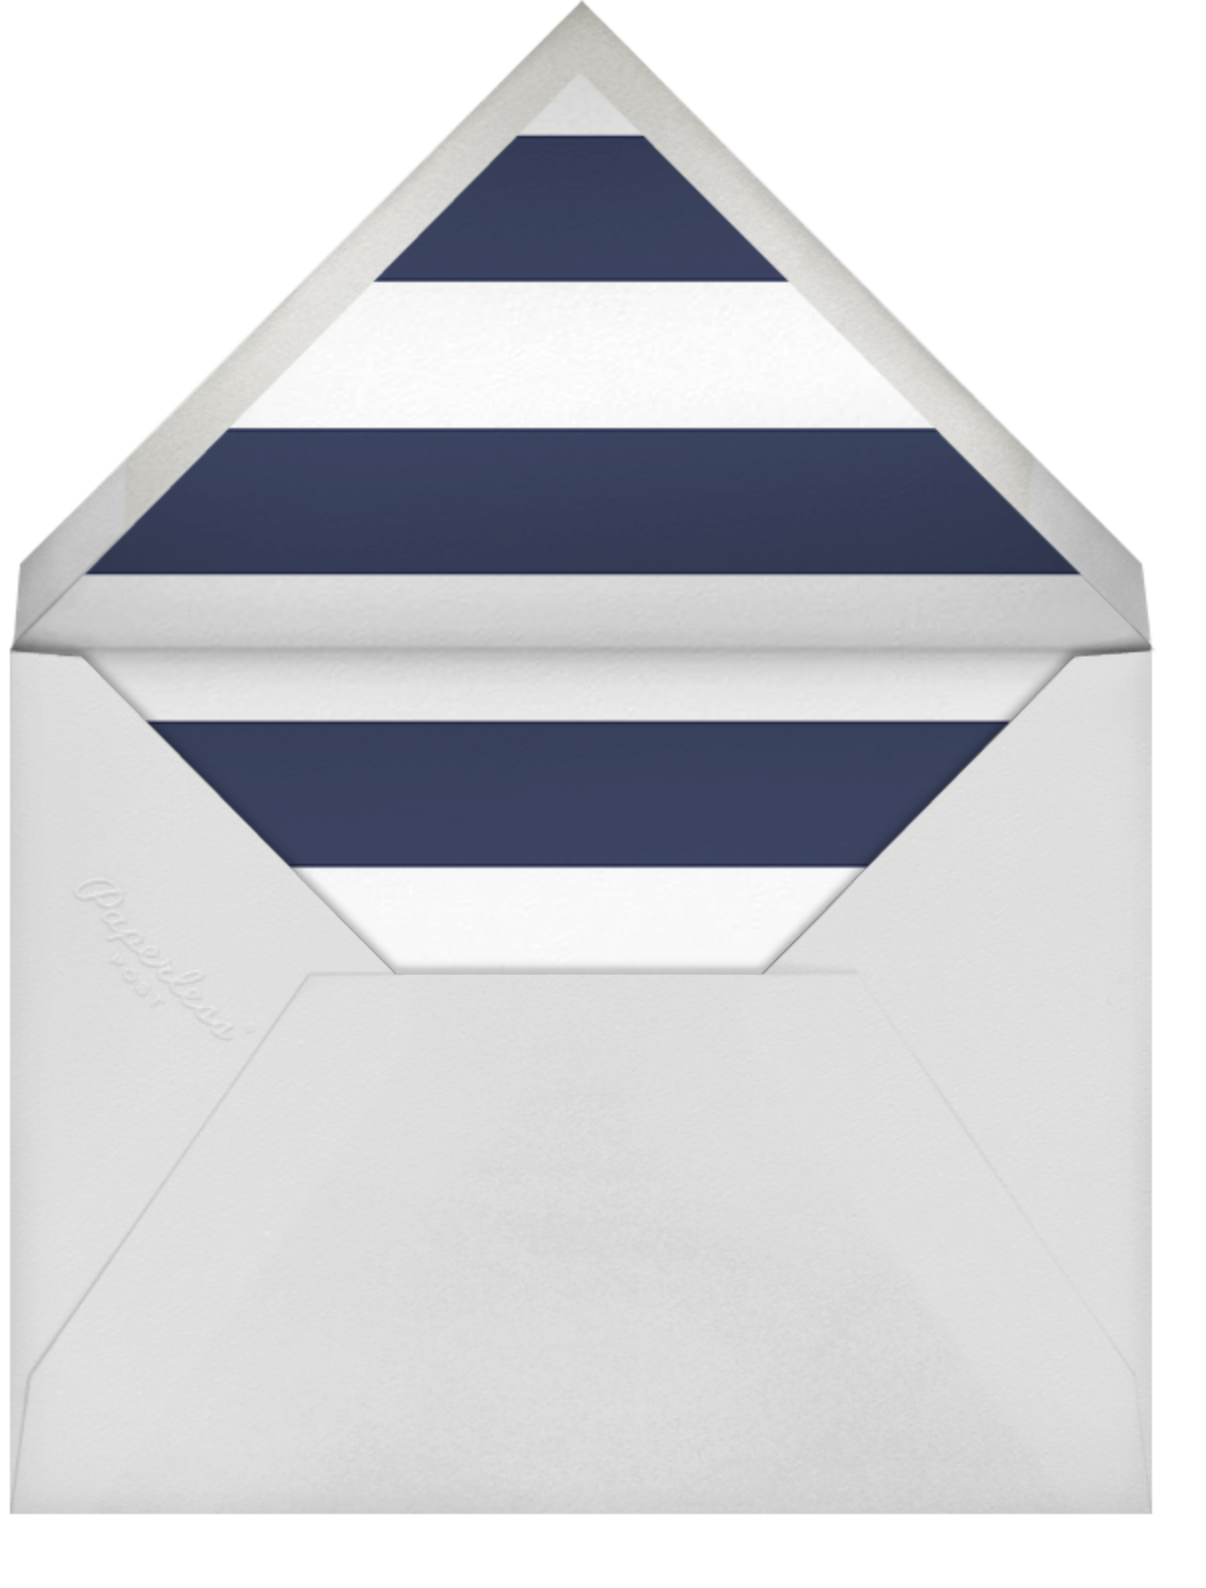 Stripe Suite (Invitation) - Navy - kate spade new york - All - envelope back